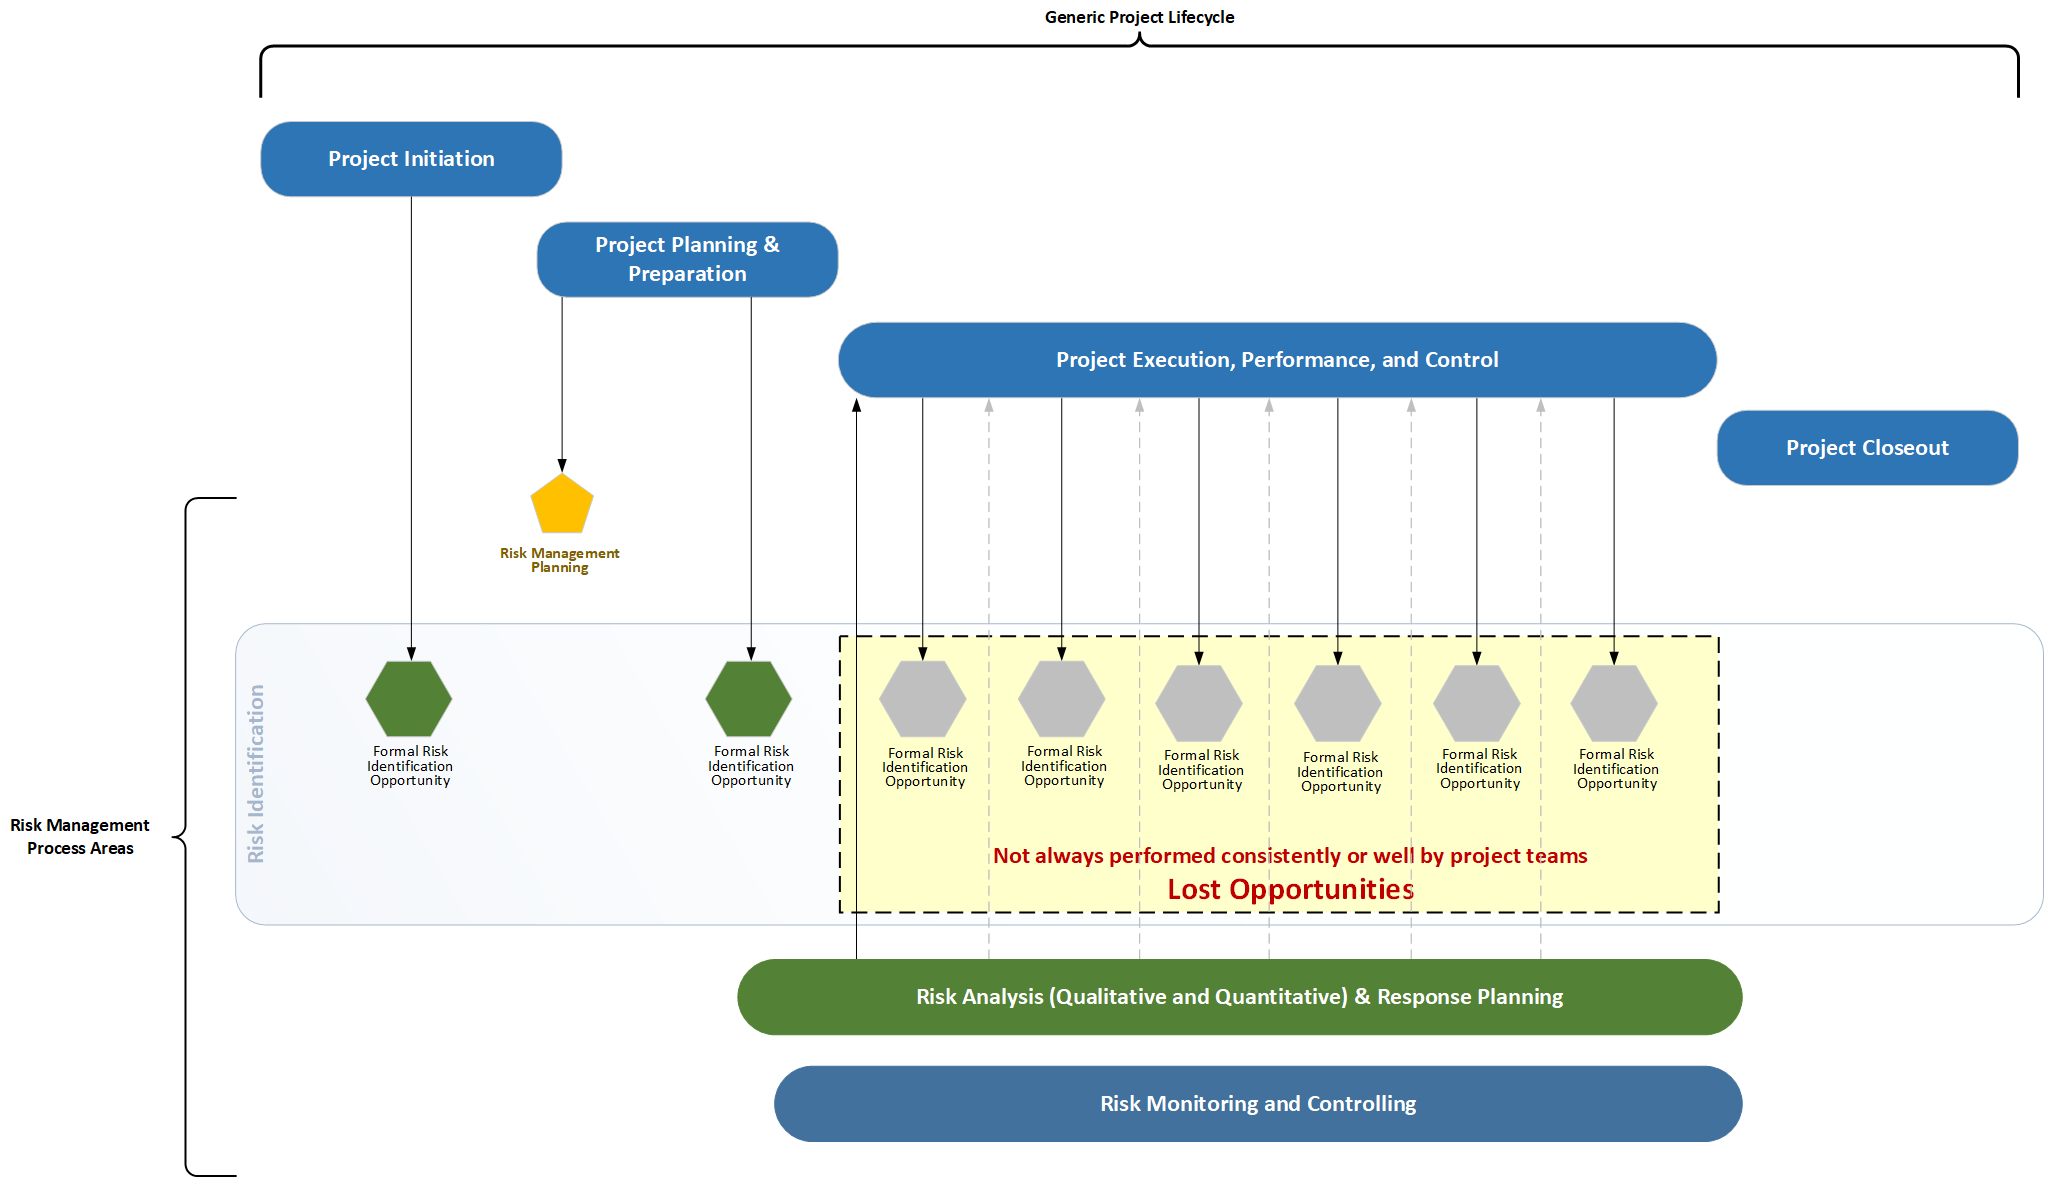 Image depicting risk management process